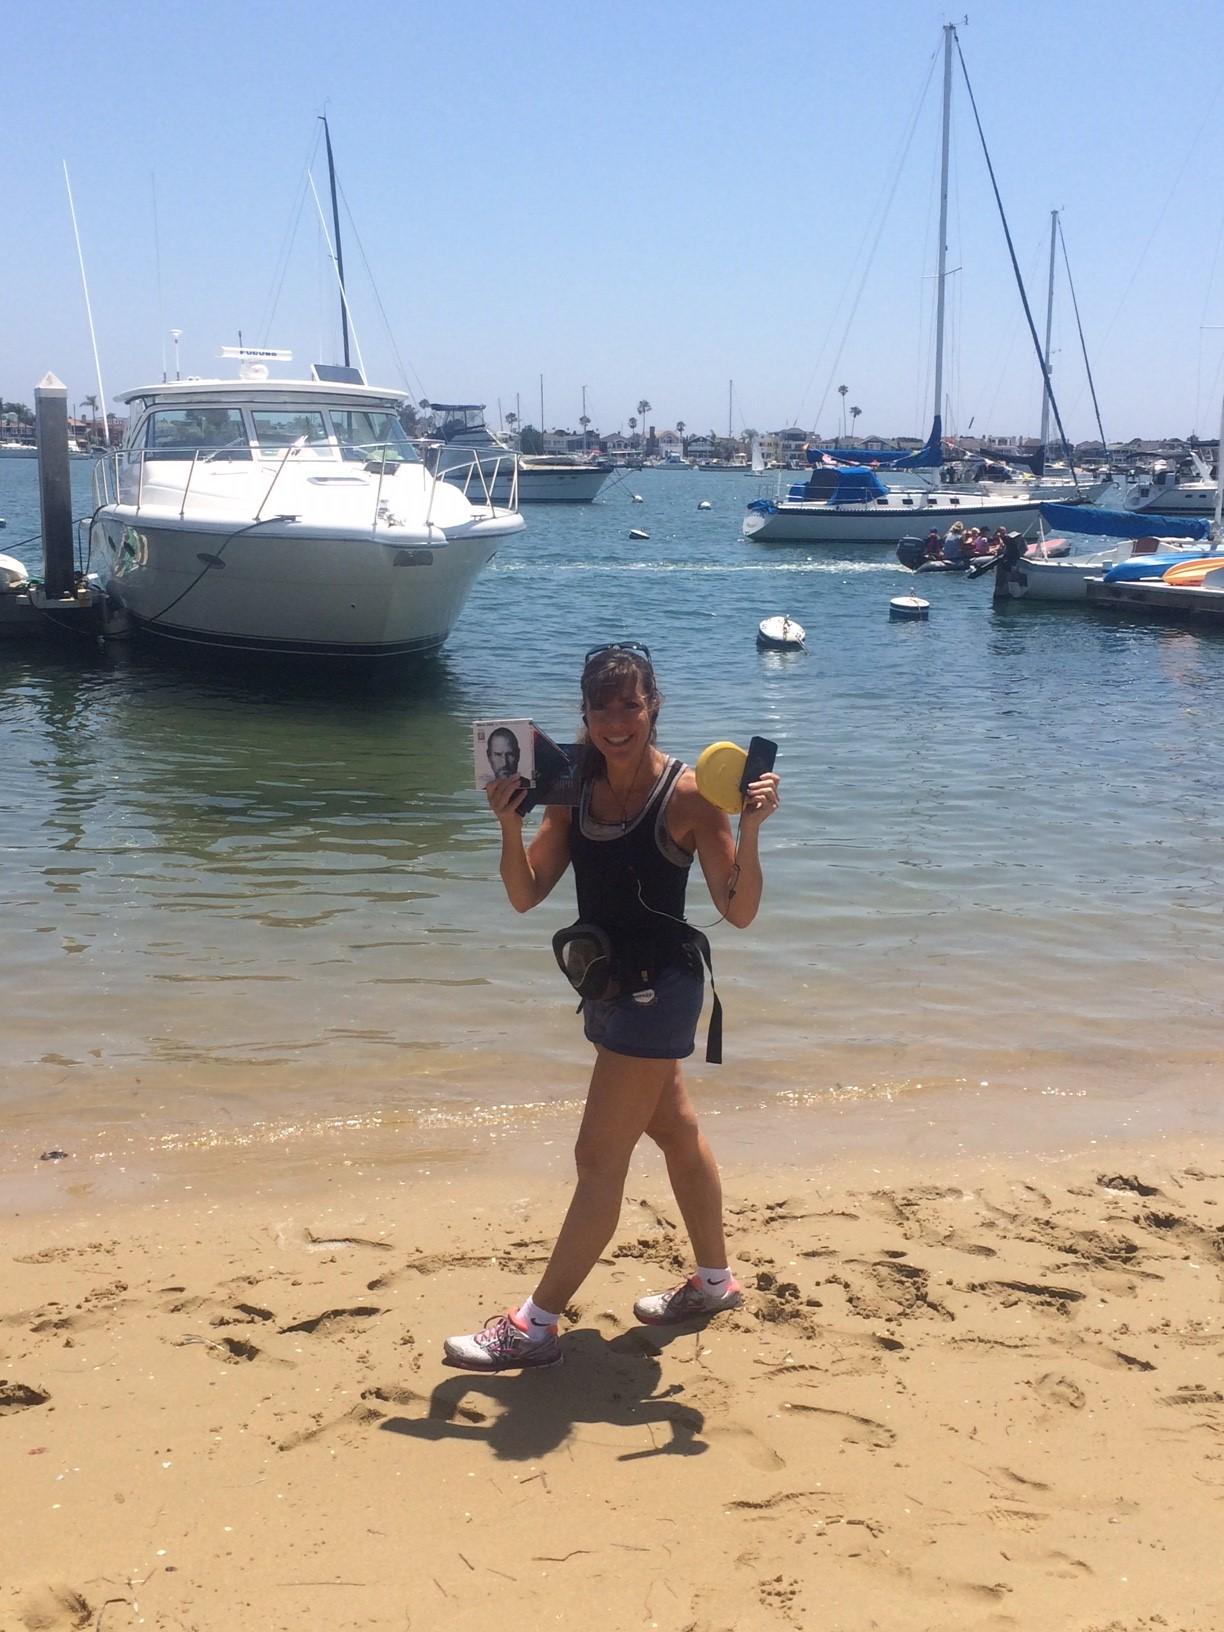 Terri with her audio books on the beach